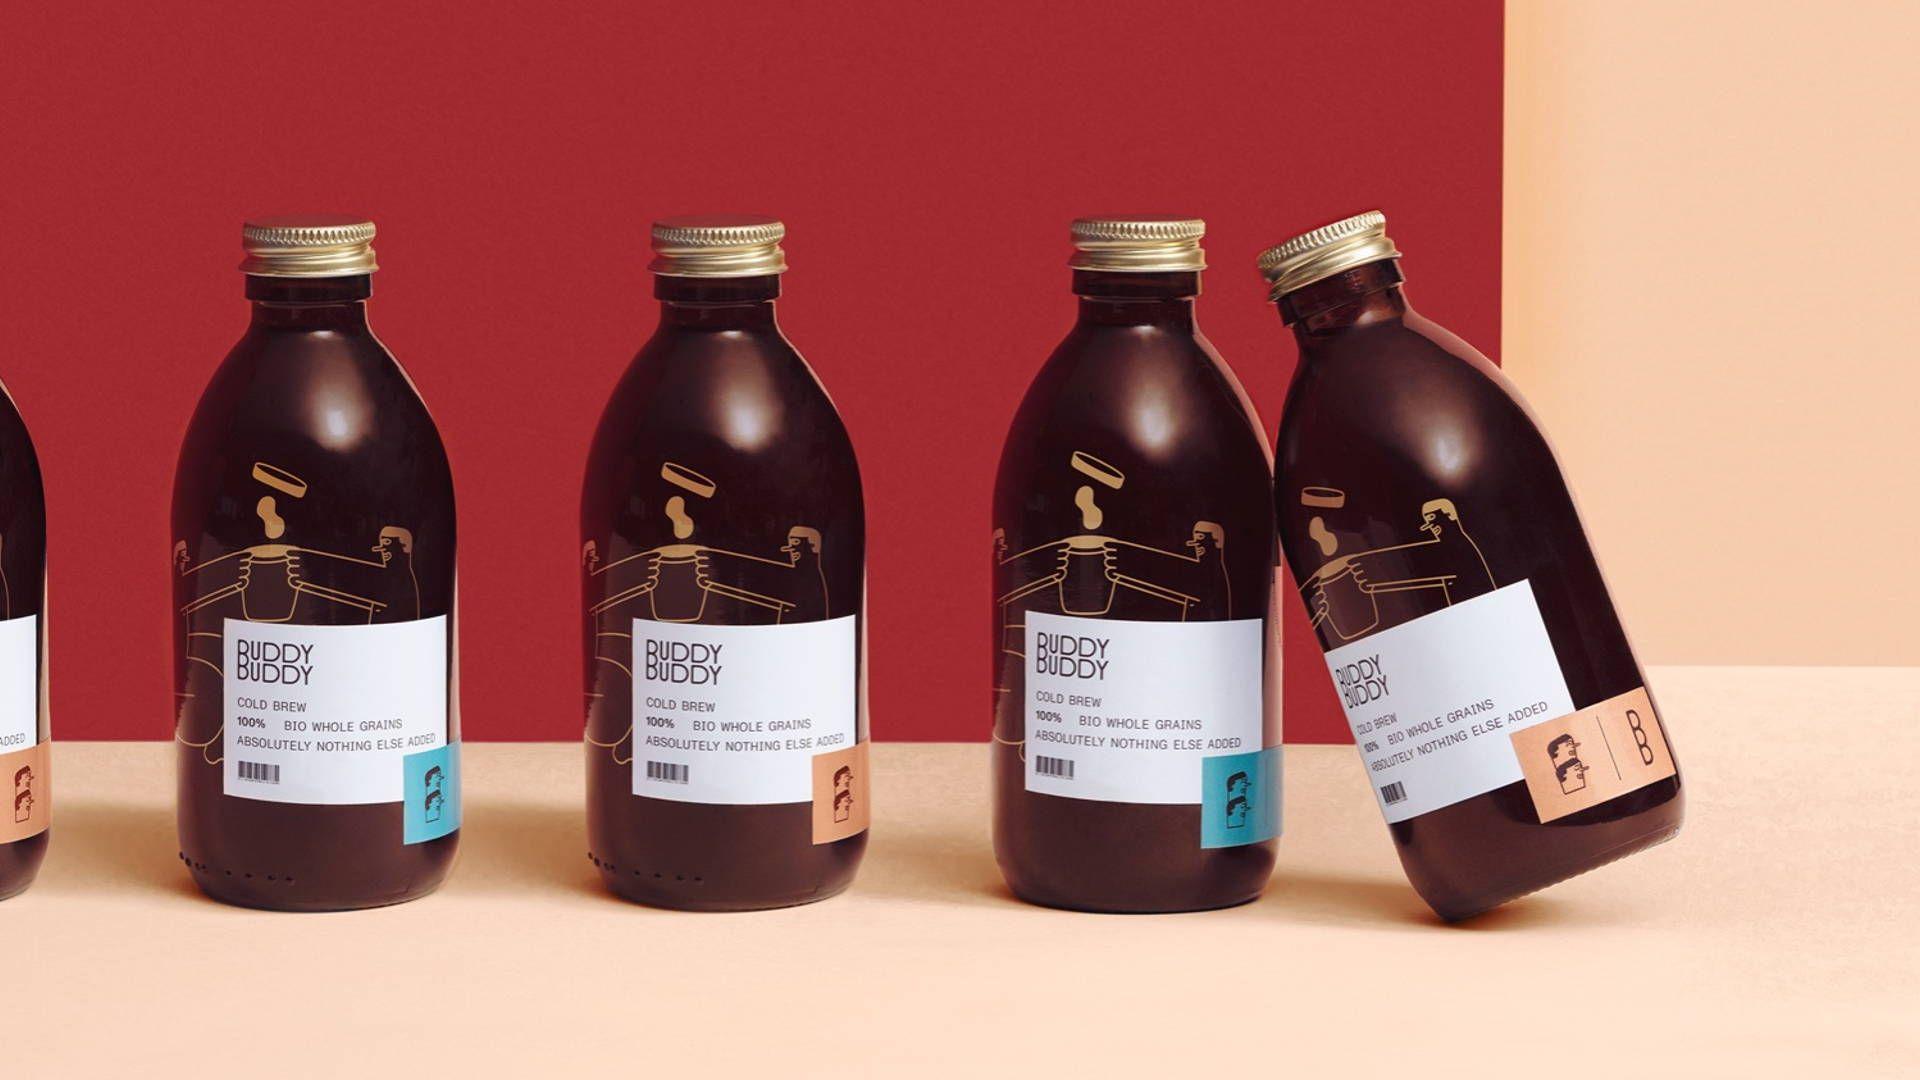 Pin By Vanessa Tsen On Beverage Packaging In 2020 Butter Brands Blog Design Inspiration Brand Packaging